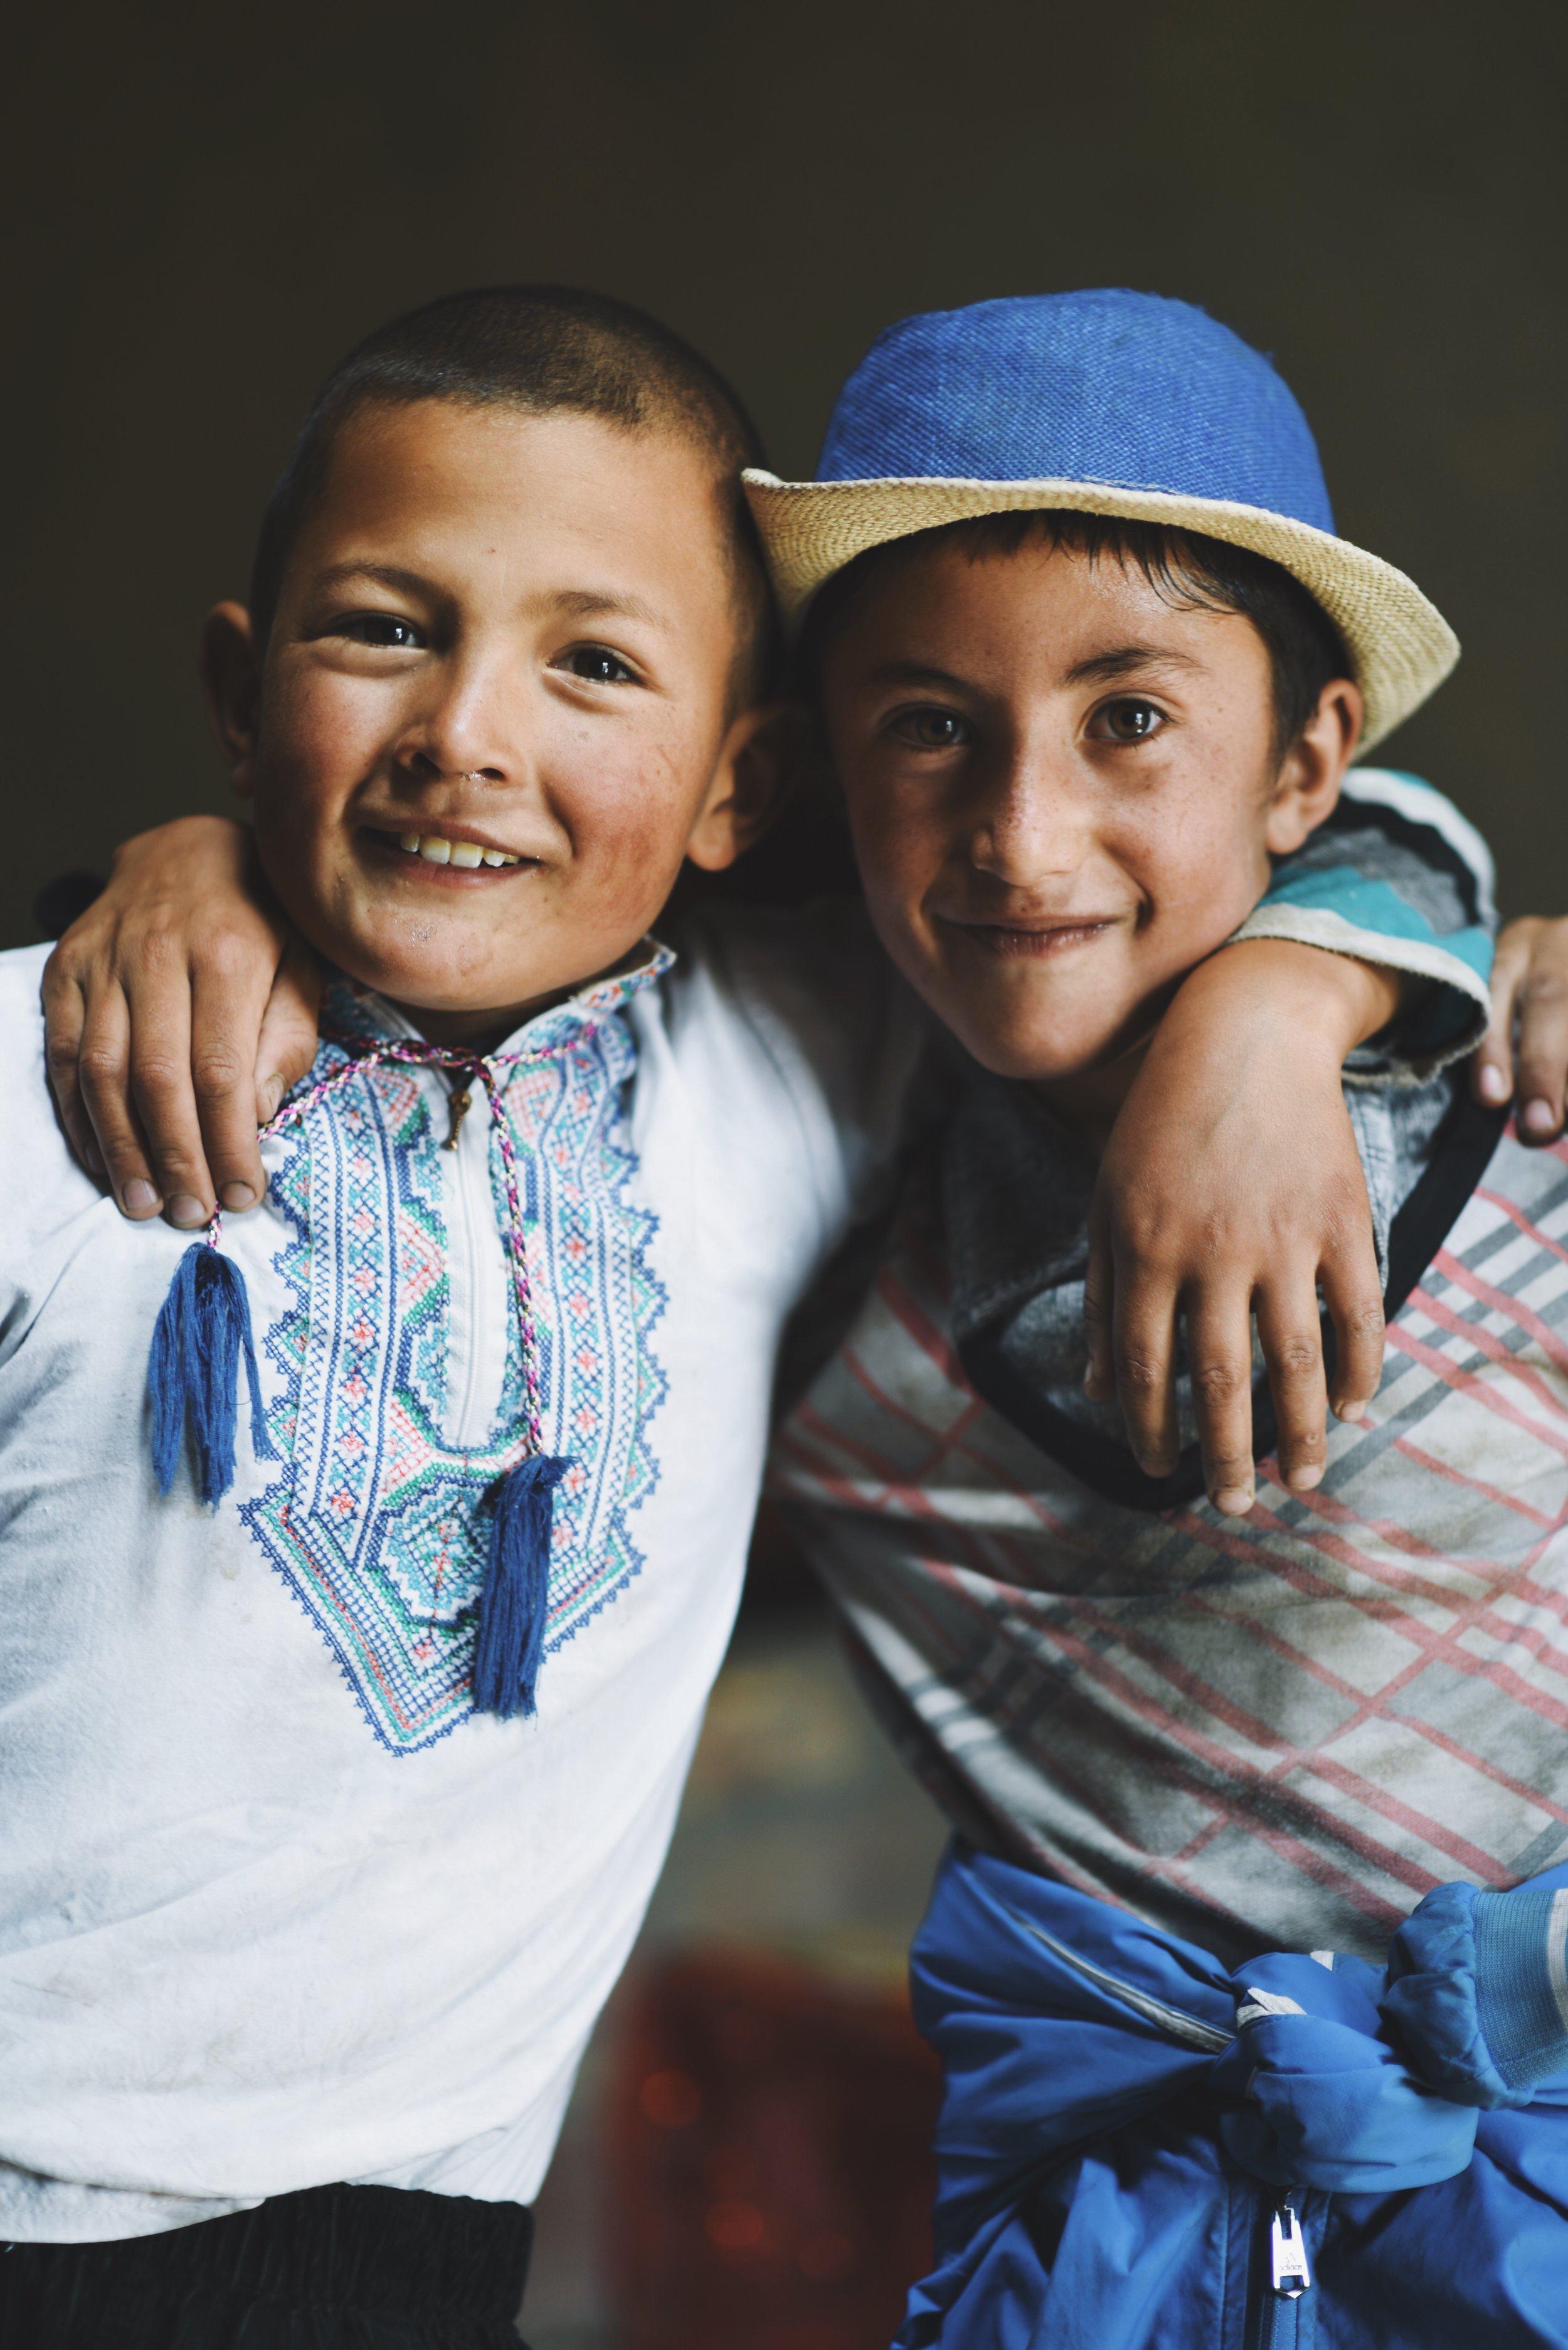 (Photography) Kashgar Kids, China, 2017